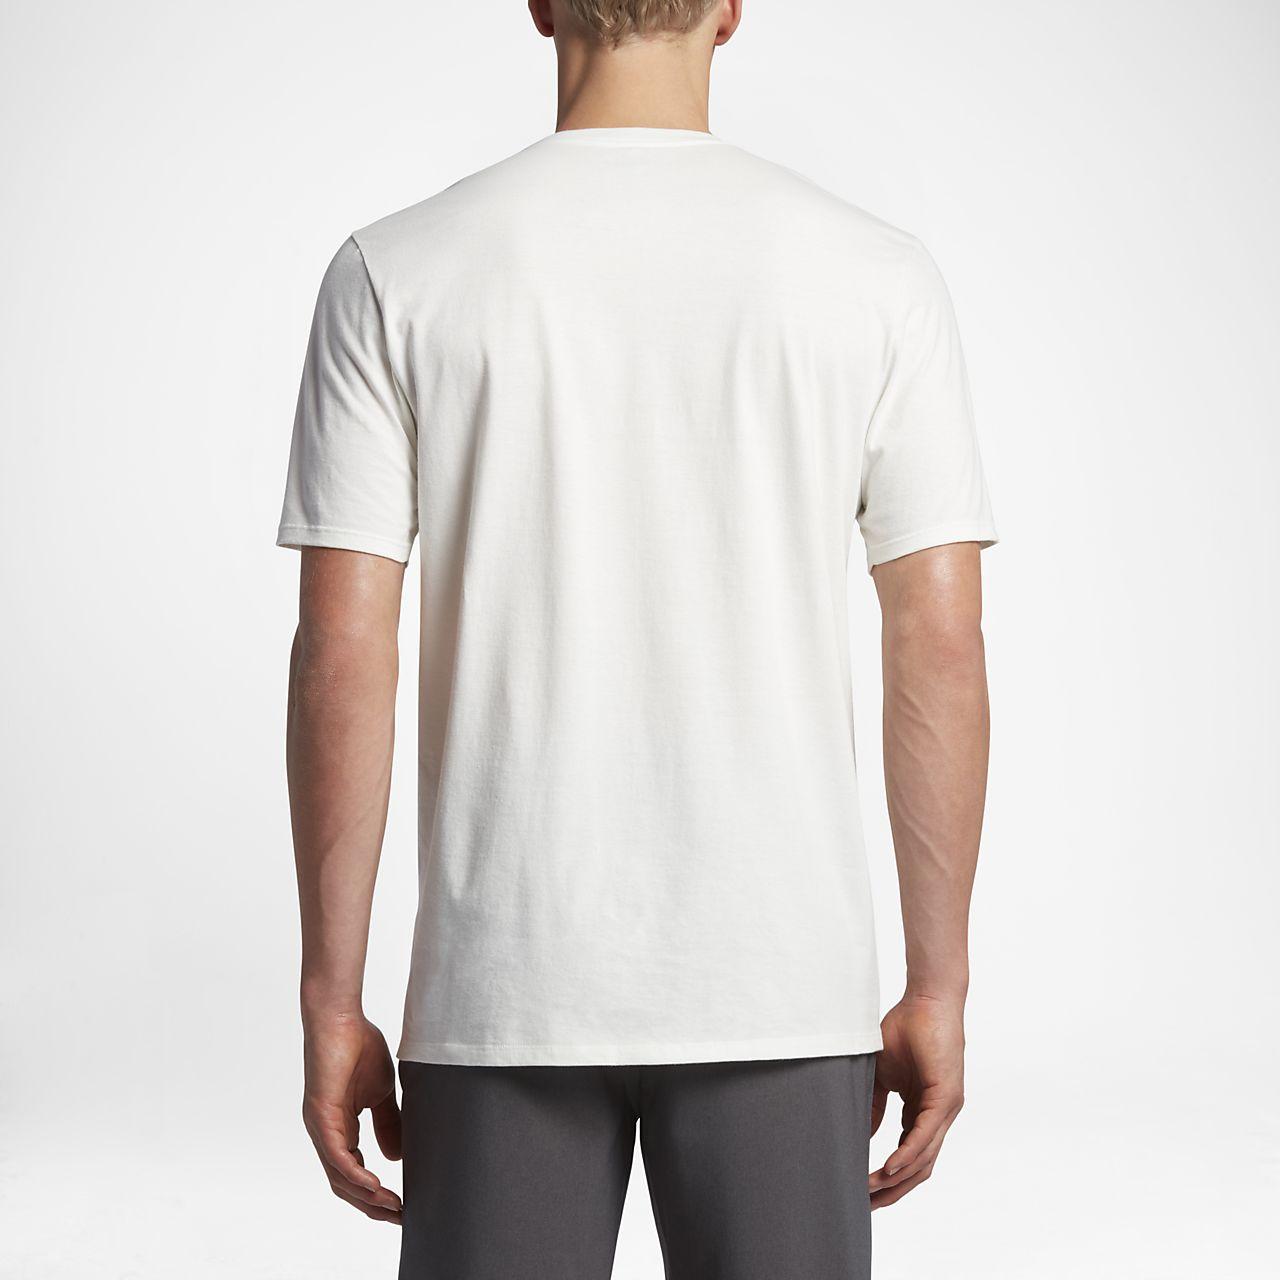 ... Hurley Surf Trip Men's T-Shirt